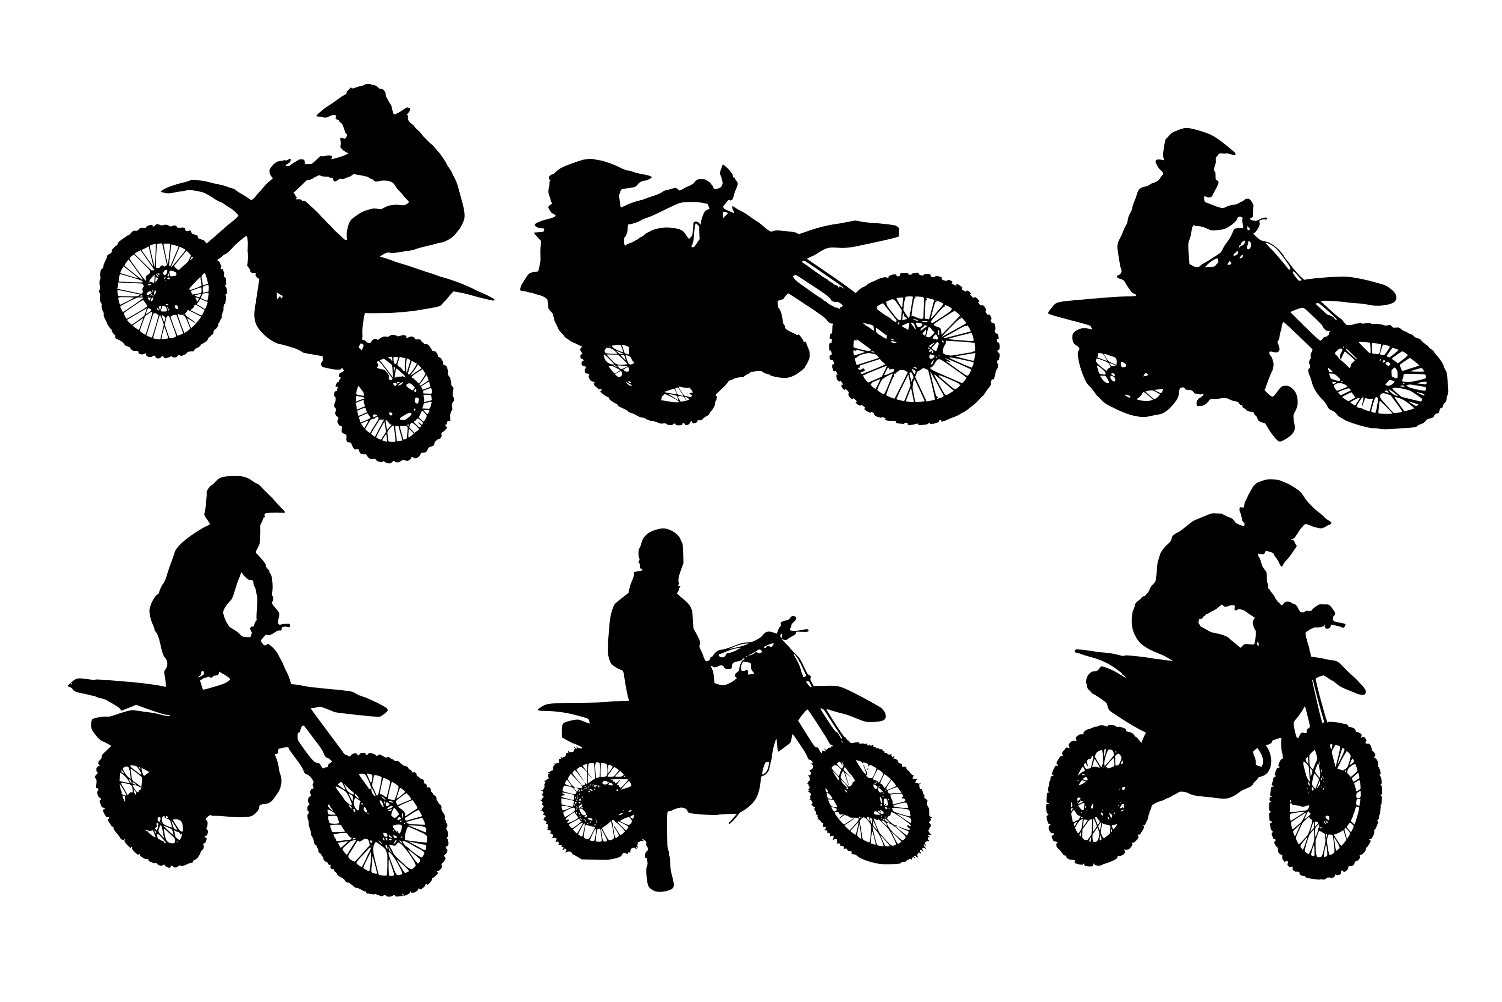 6 motocross silhouette png transparent onlygfxcom